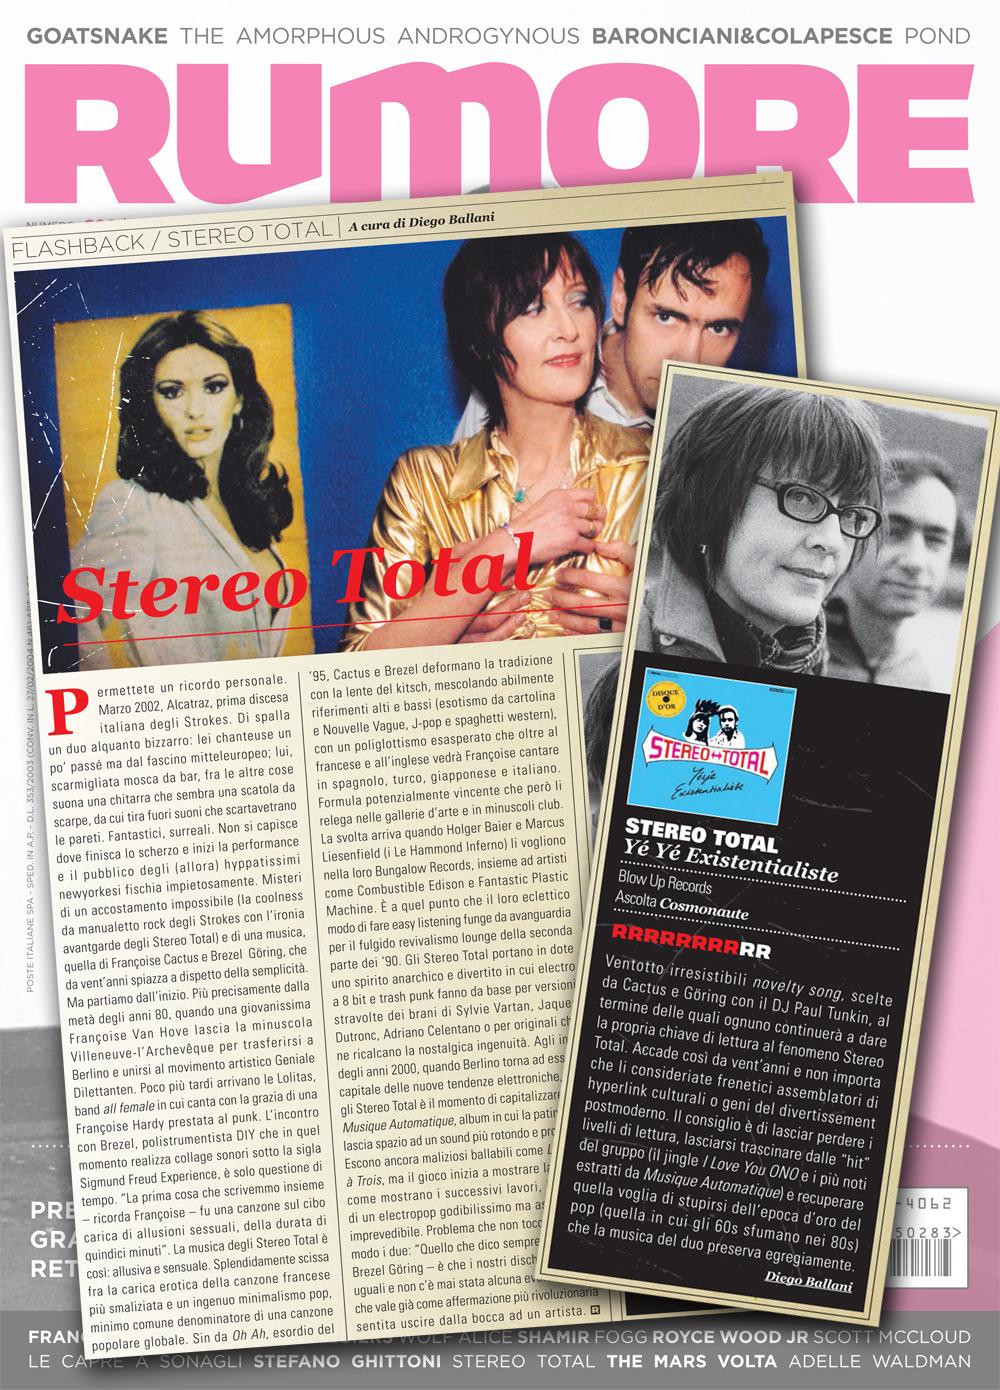 Rumore Flashback / Album Reviews Stereo Total Yéyé Existentialiste